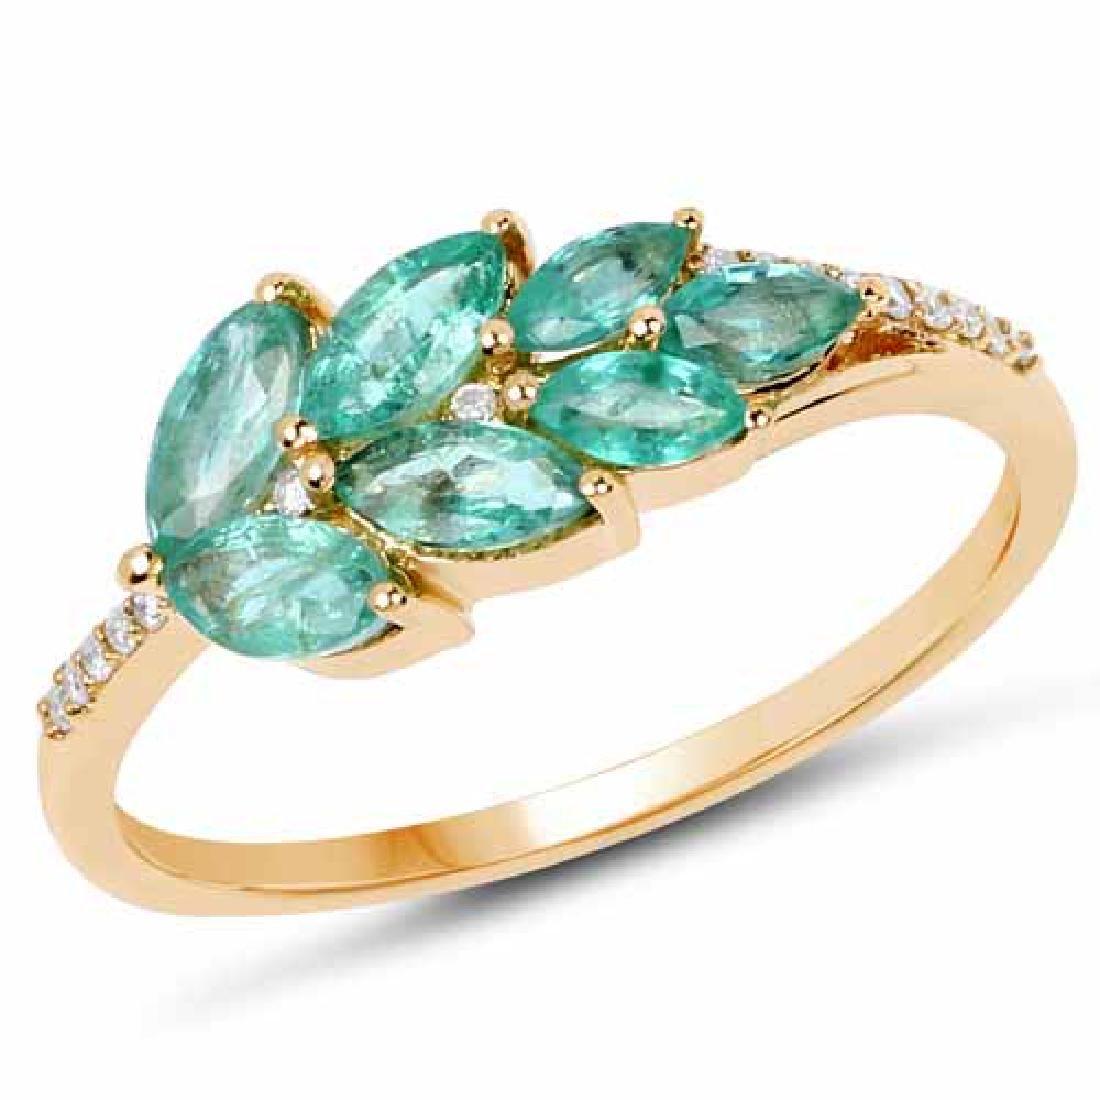 0.69 Carat Genuine Zambian Emerald and White Diamond 14